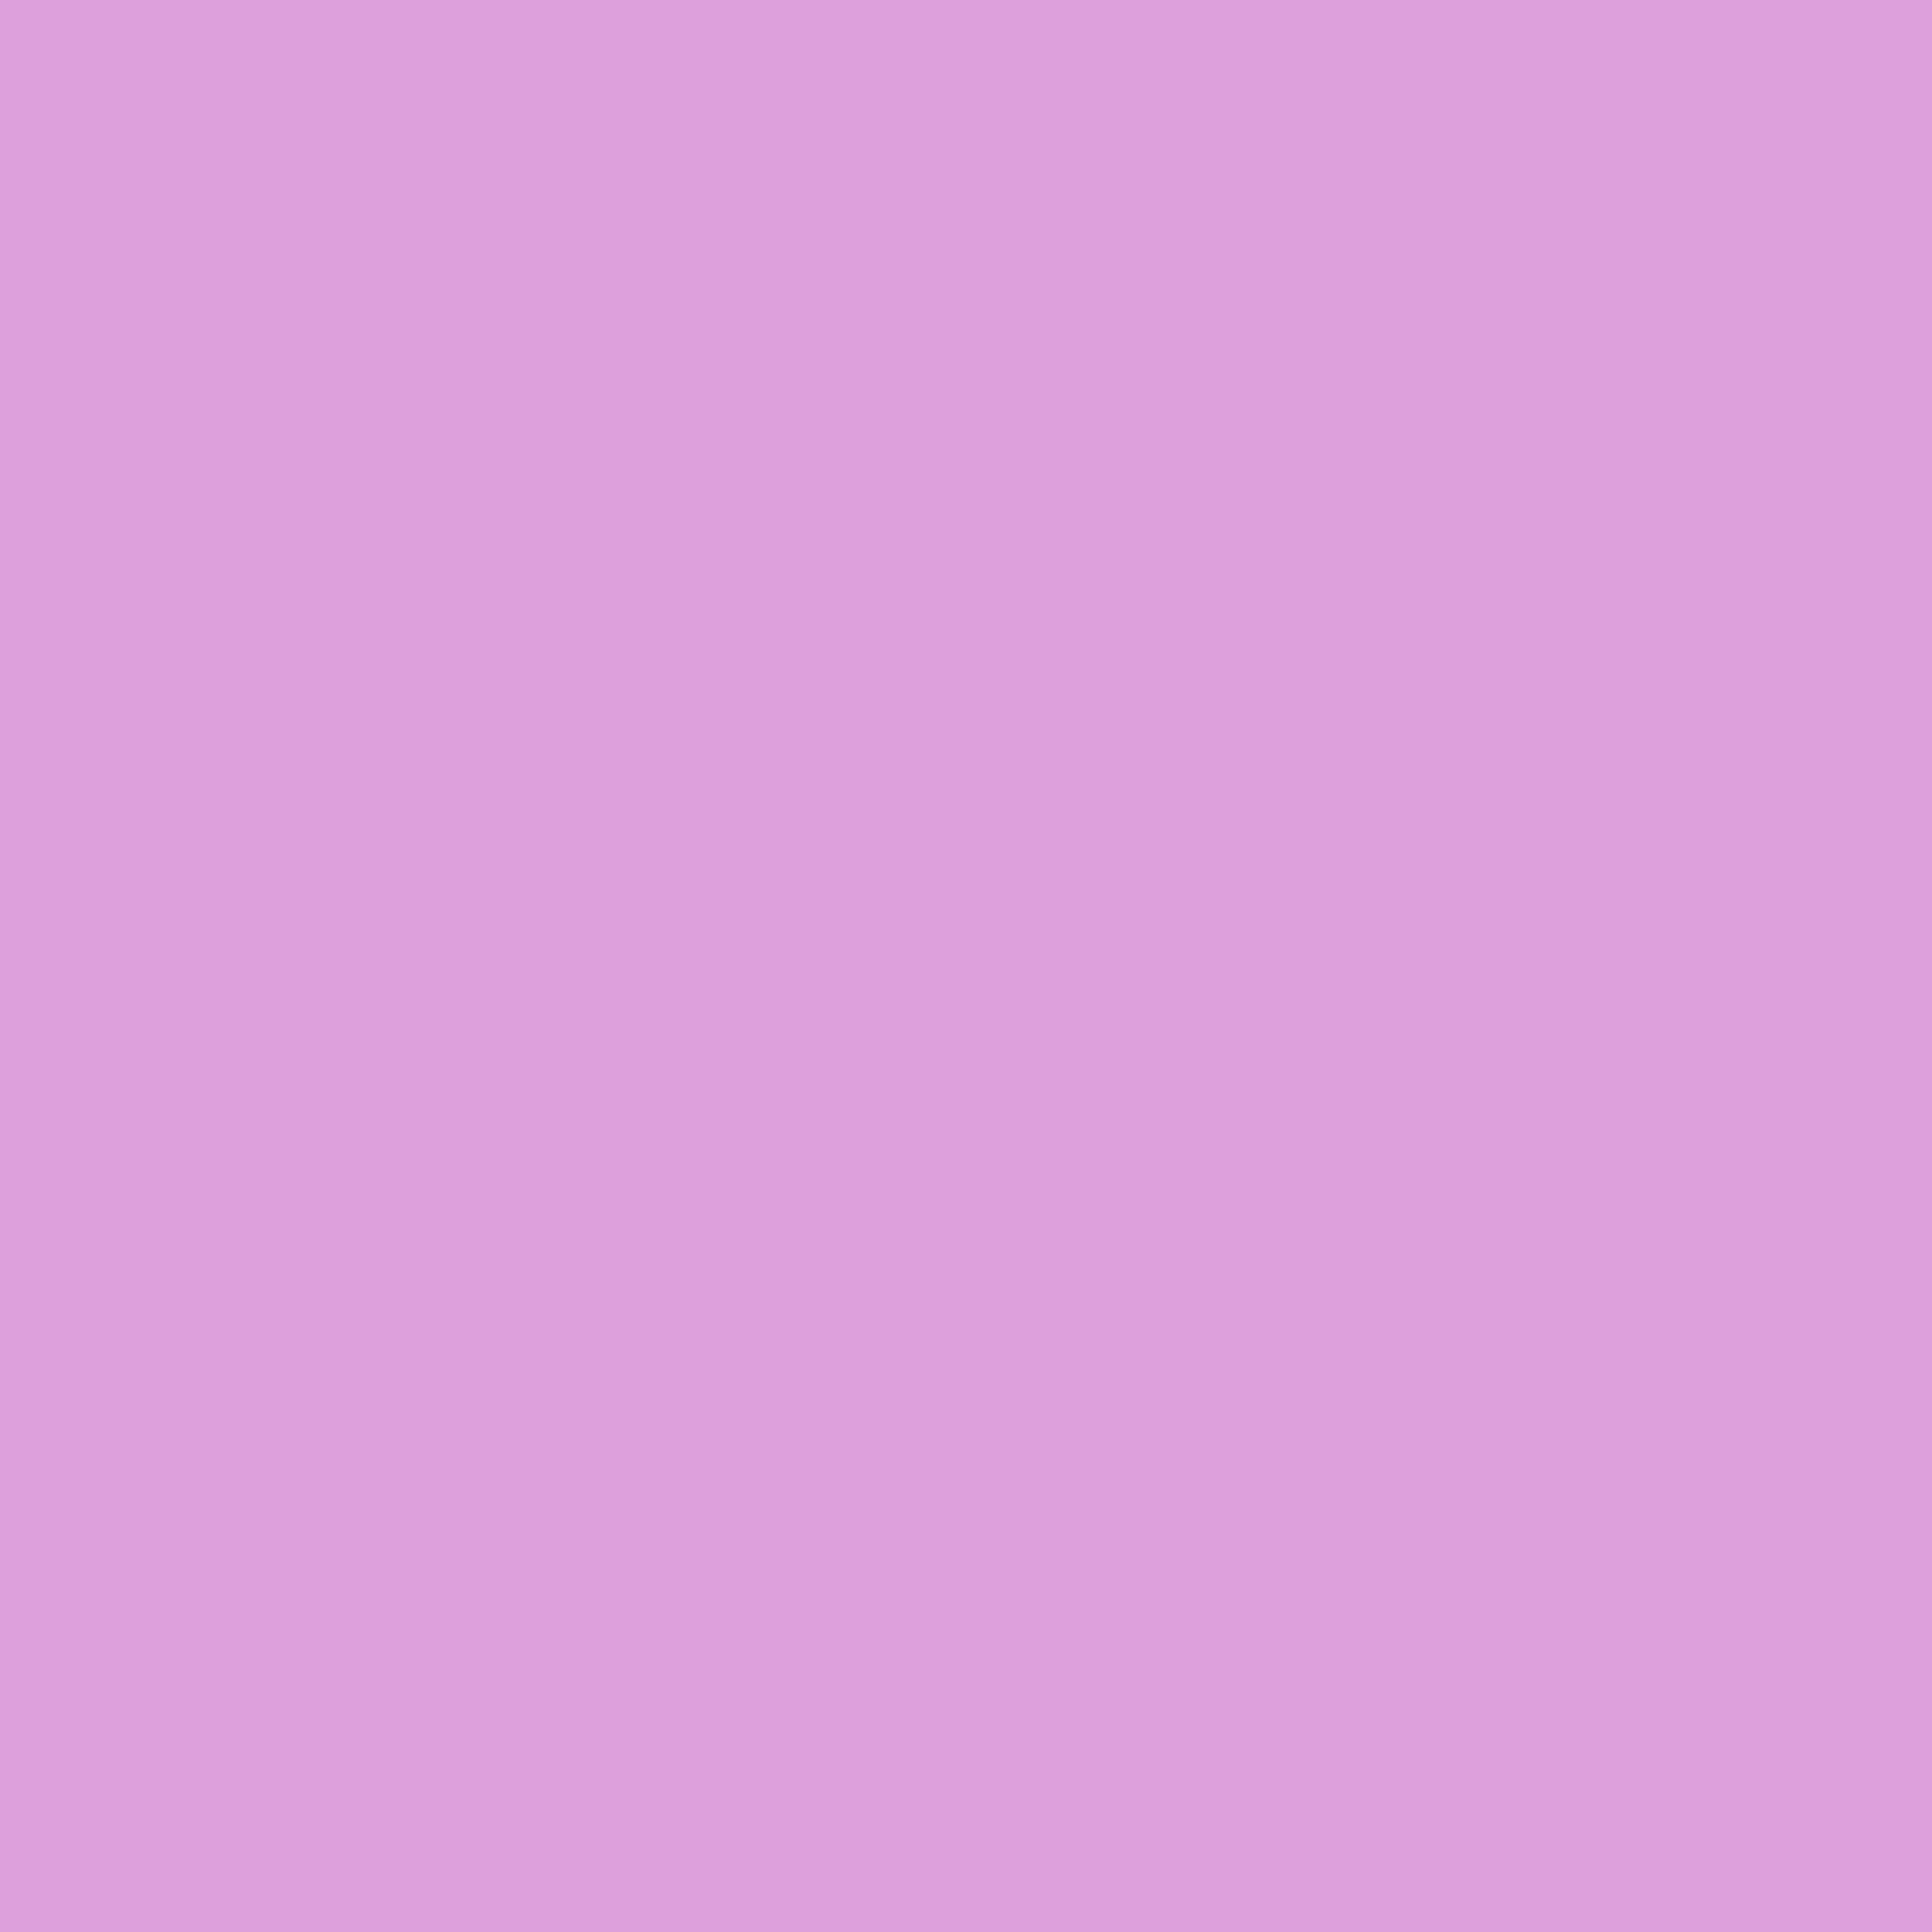 2732x2732 Plum Web Solid Color Background